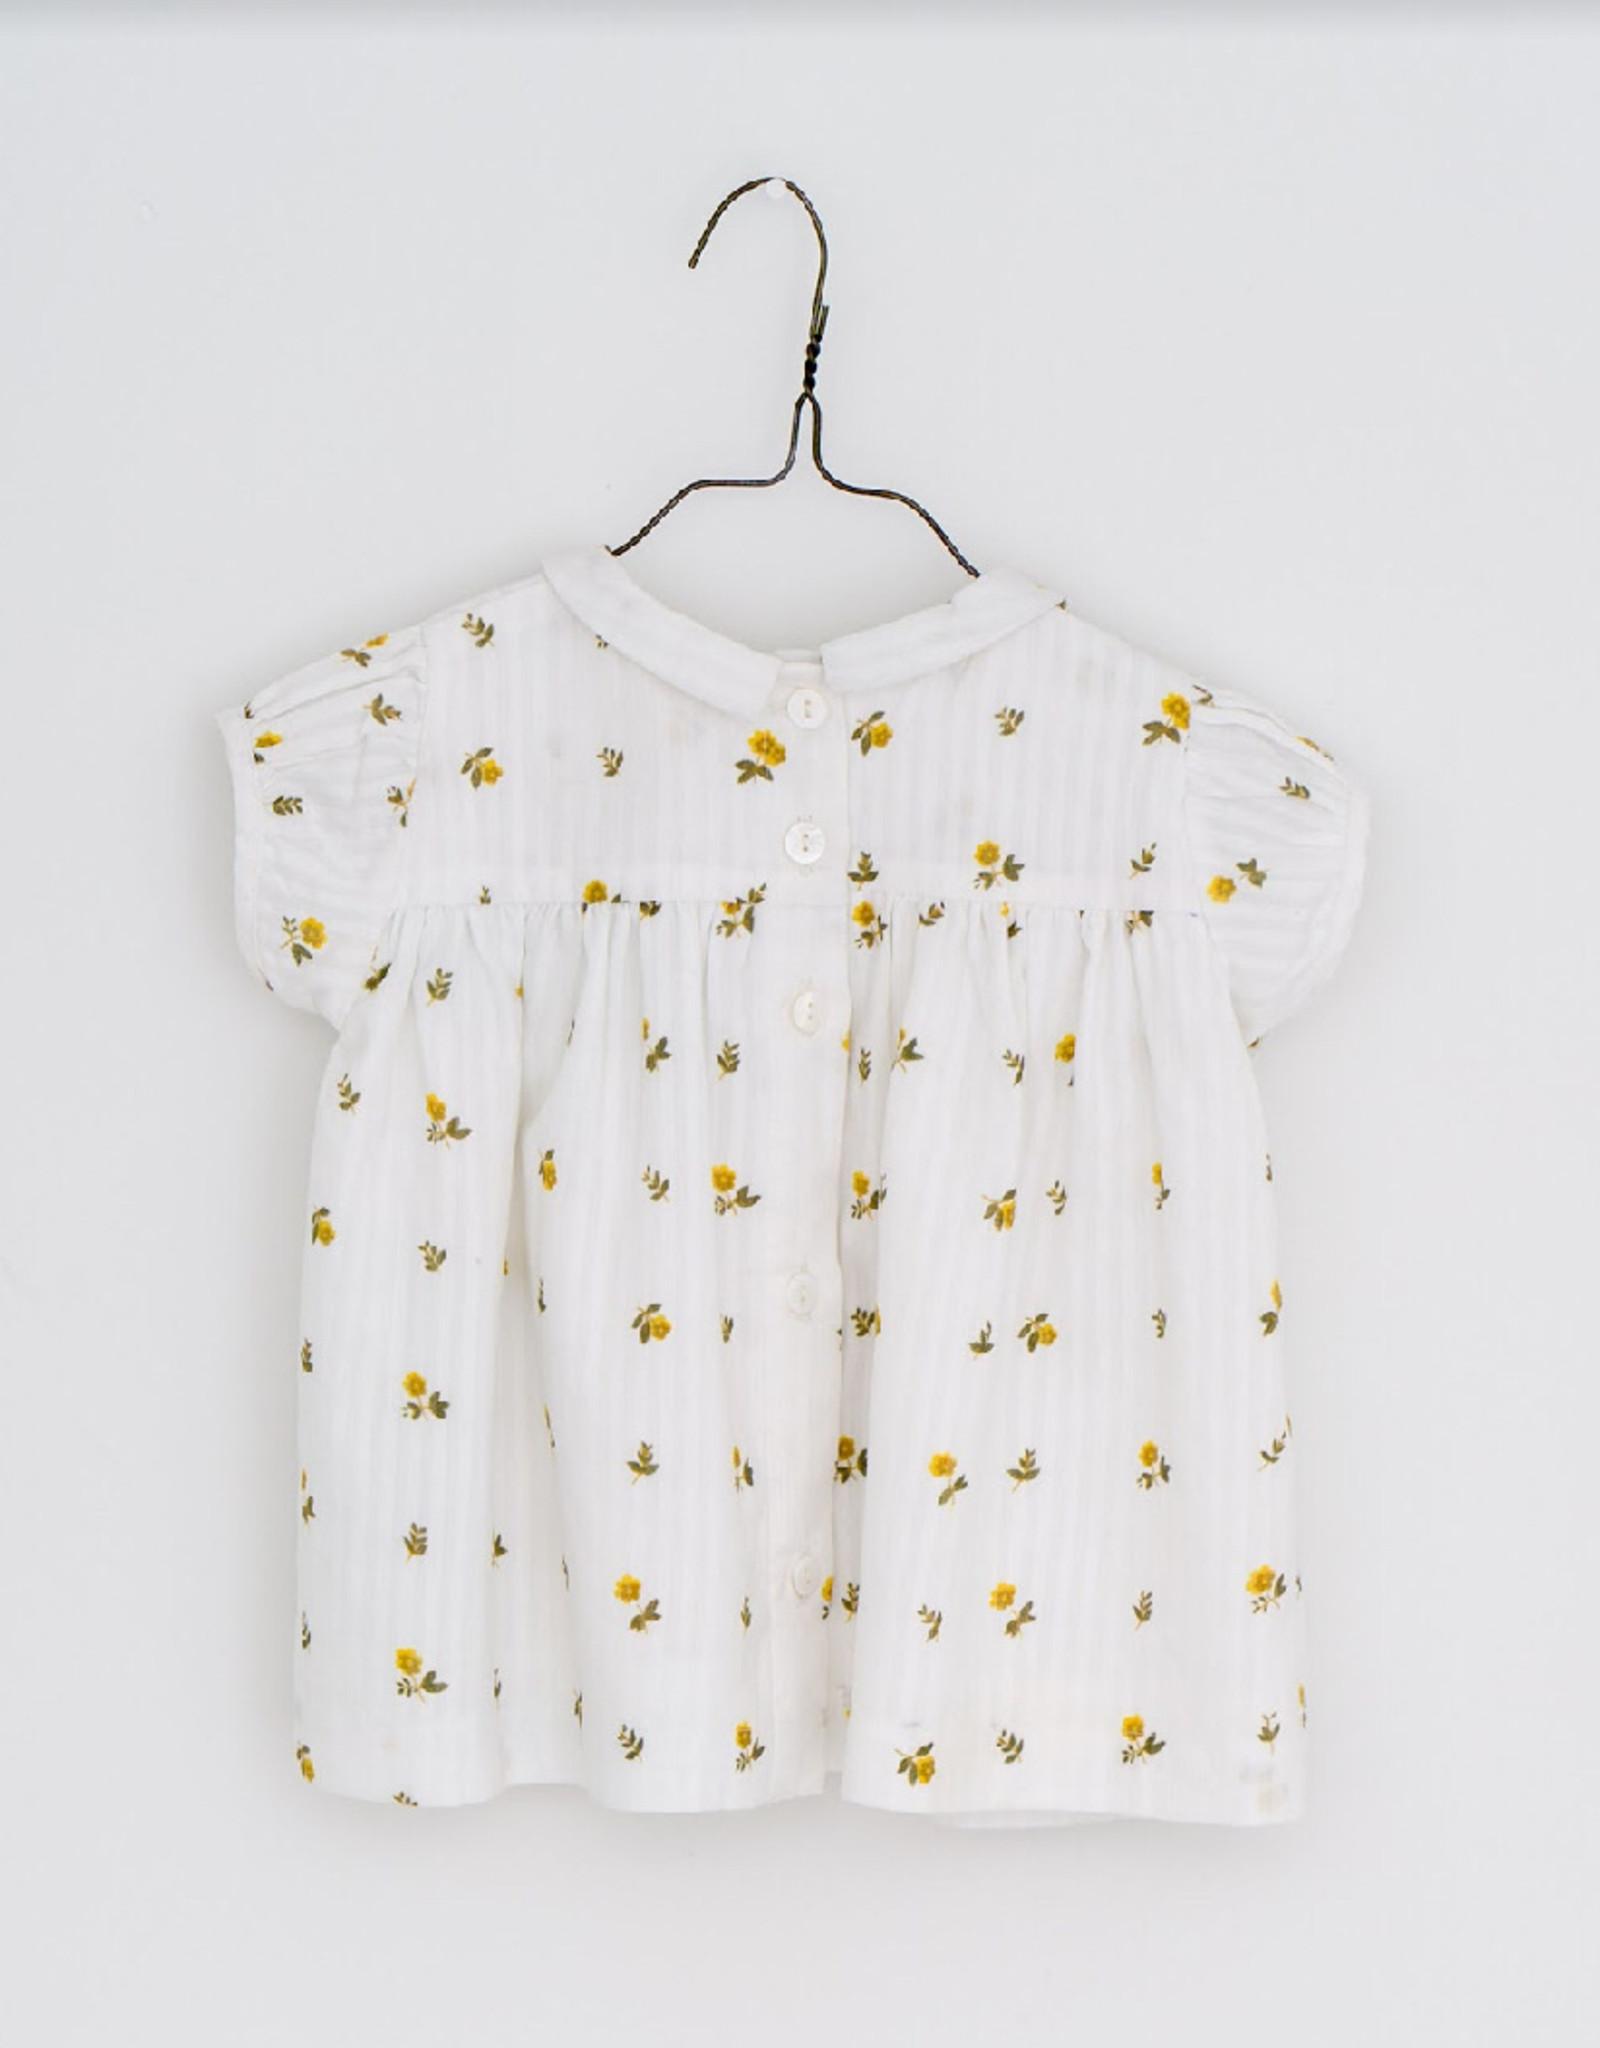 Little Cotton clothes Juno Blouse in Clover Floral Seersucker